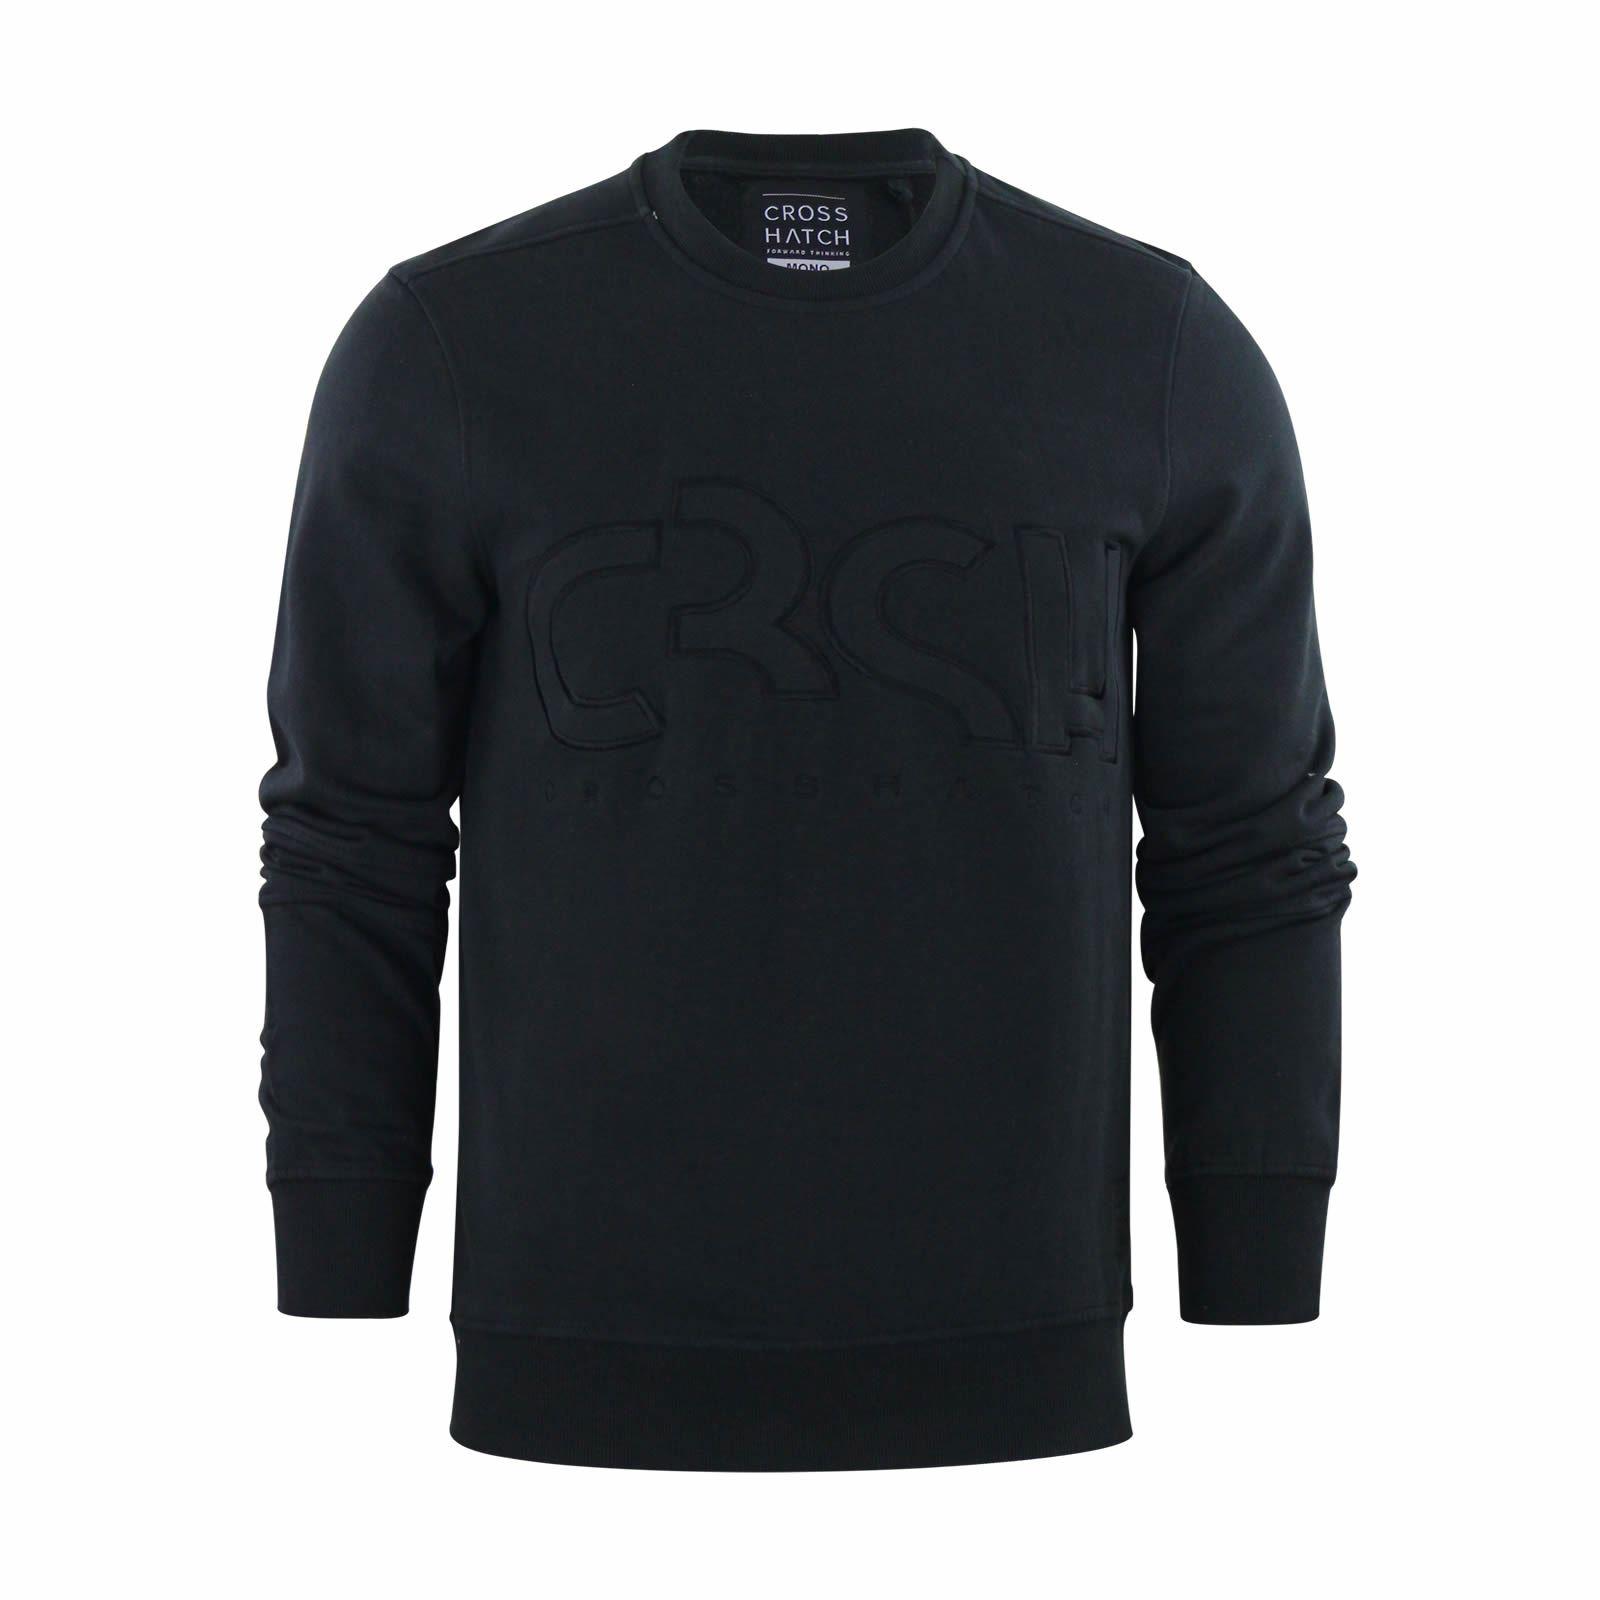 Details about Crosshatch Jathan Mens Sweater Jumper Crew Neck Sweatshirt